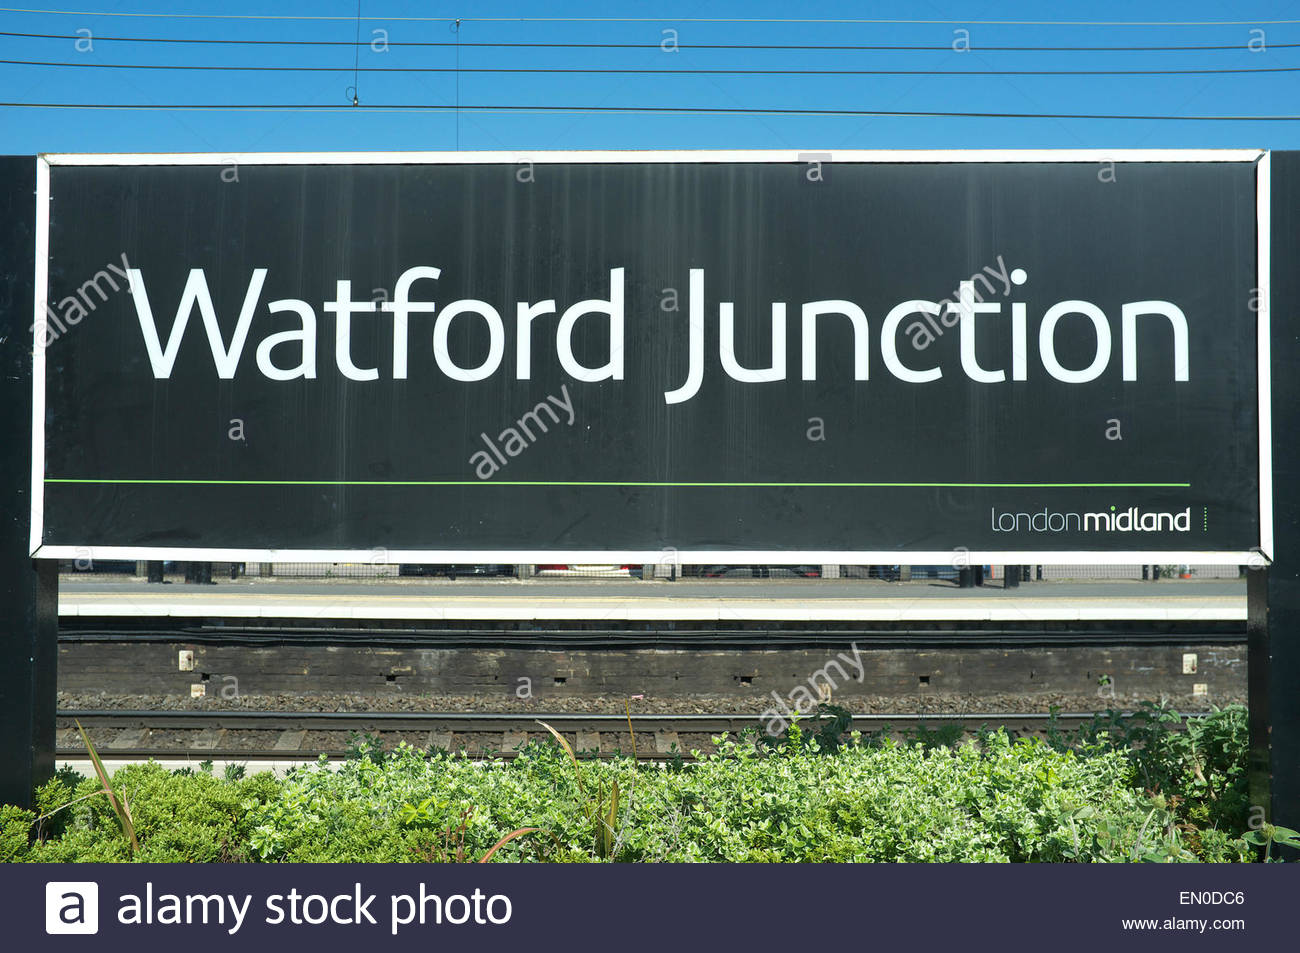 Watford Junction - railway station place name sign. Watford, Hertfordshire, UK. - Stock Image